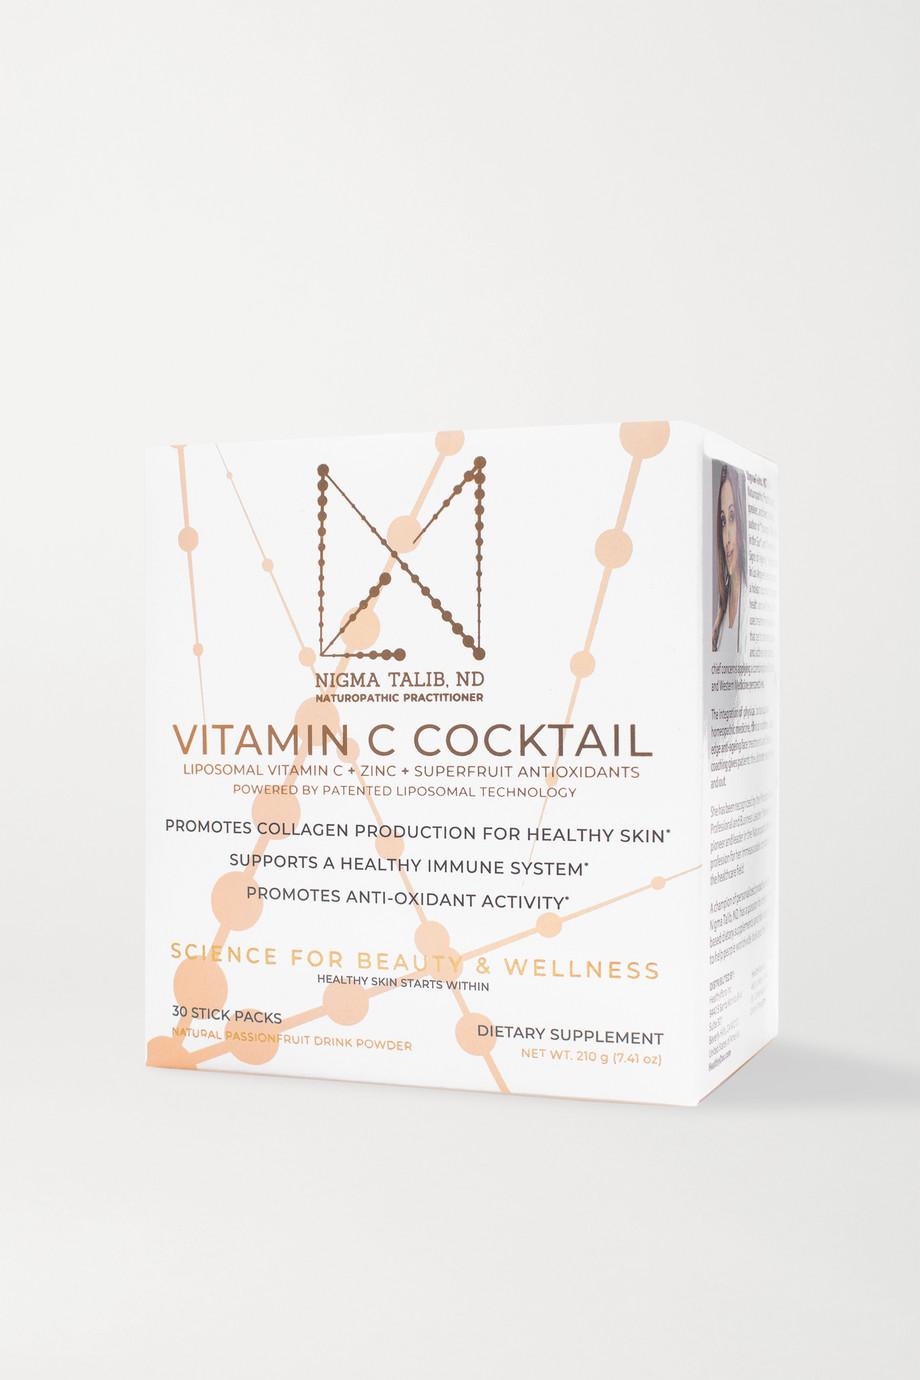 Nigma Talib ND Vitamin C Cocktail (30 servings)